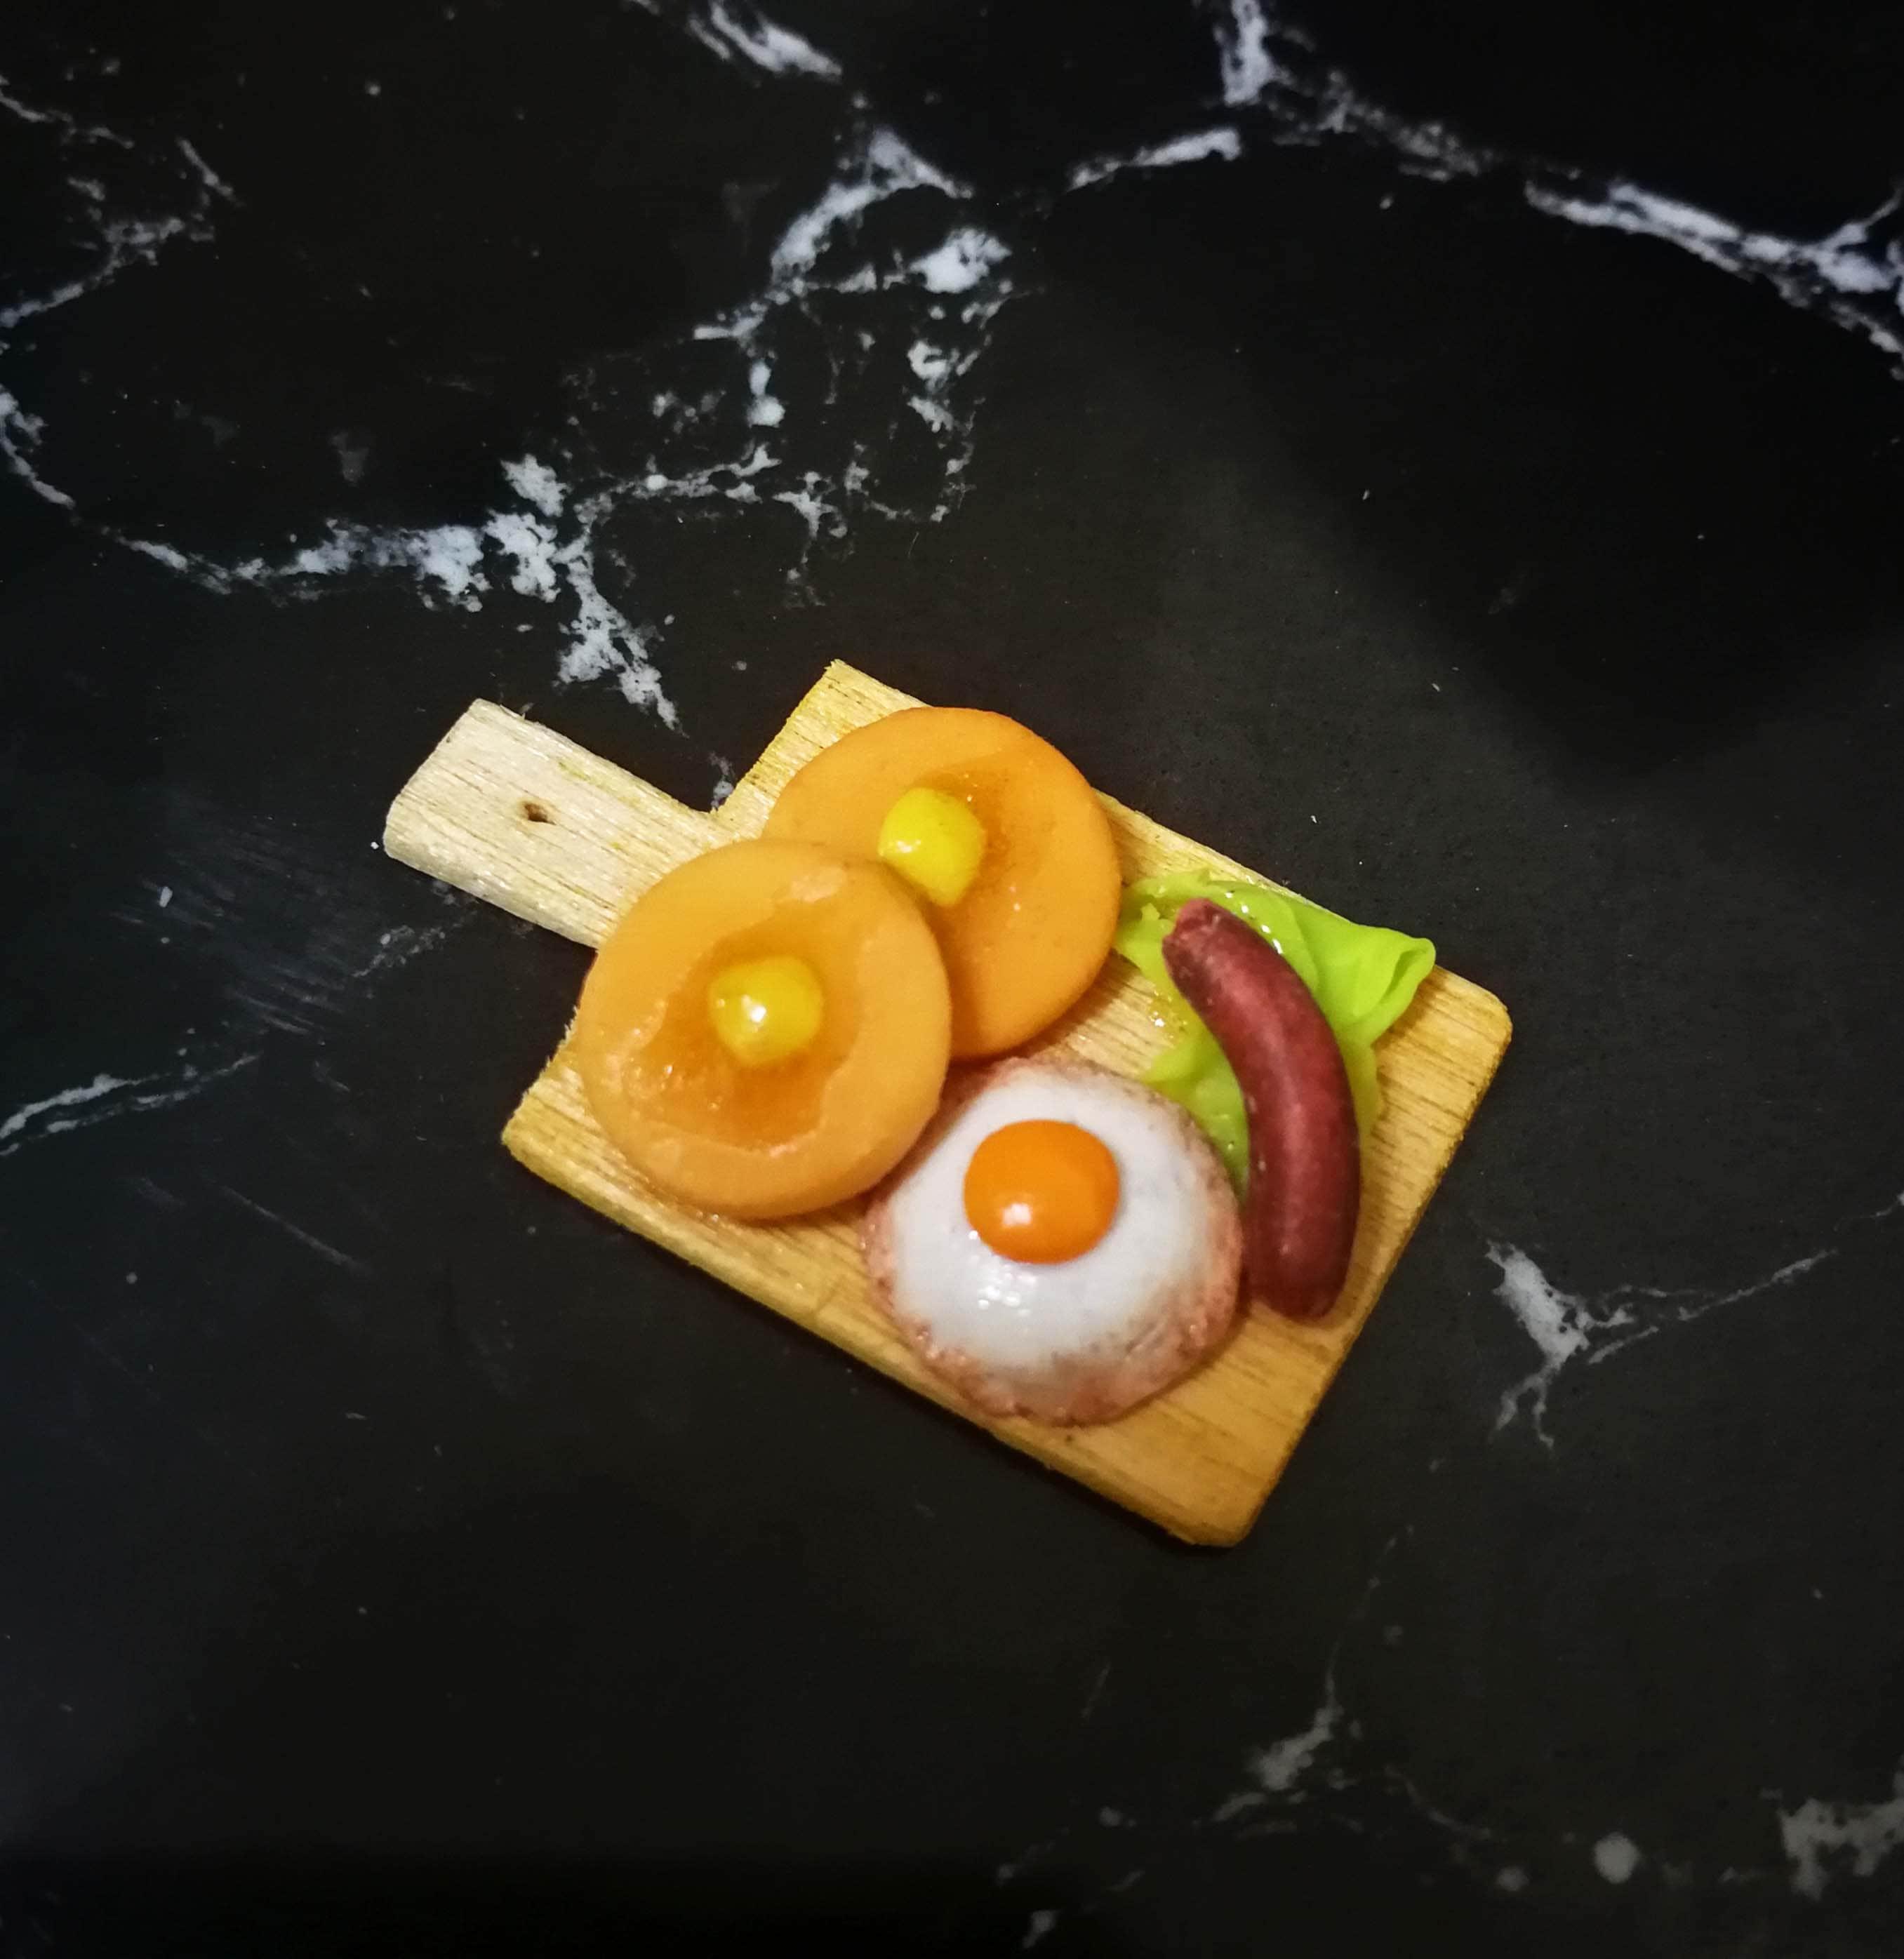 DOLLHOUSE MINIATURE FRYING PAN PANCAKE BREAKFAST FOOD